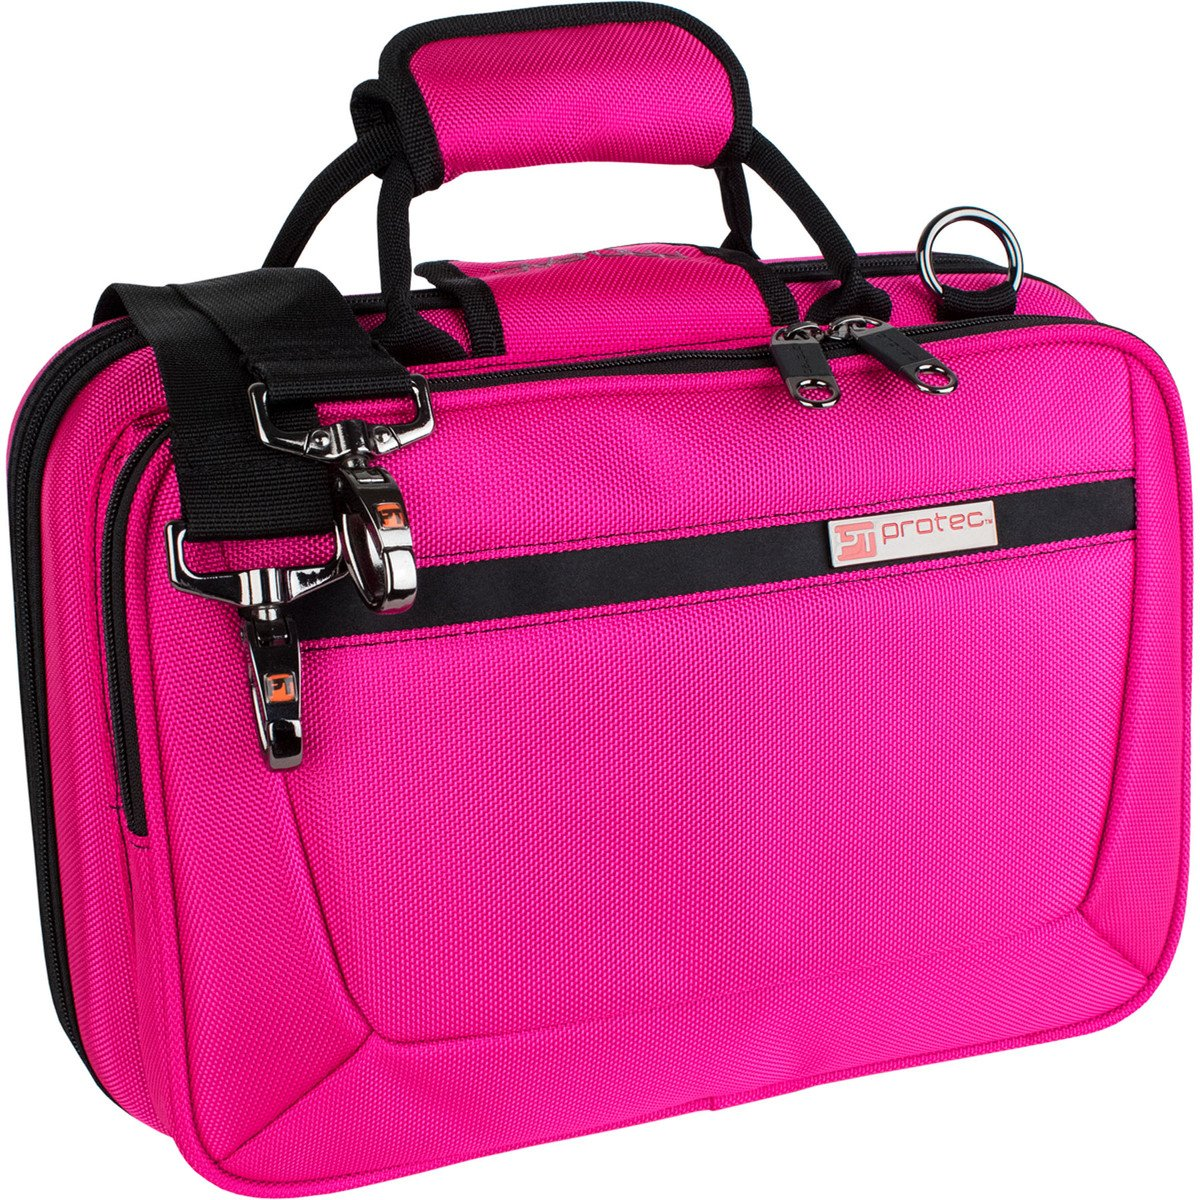 Protec Slimline Pro Pac Clarinet Case (Hot Pink)